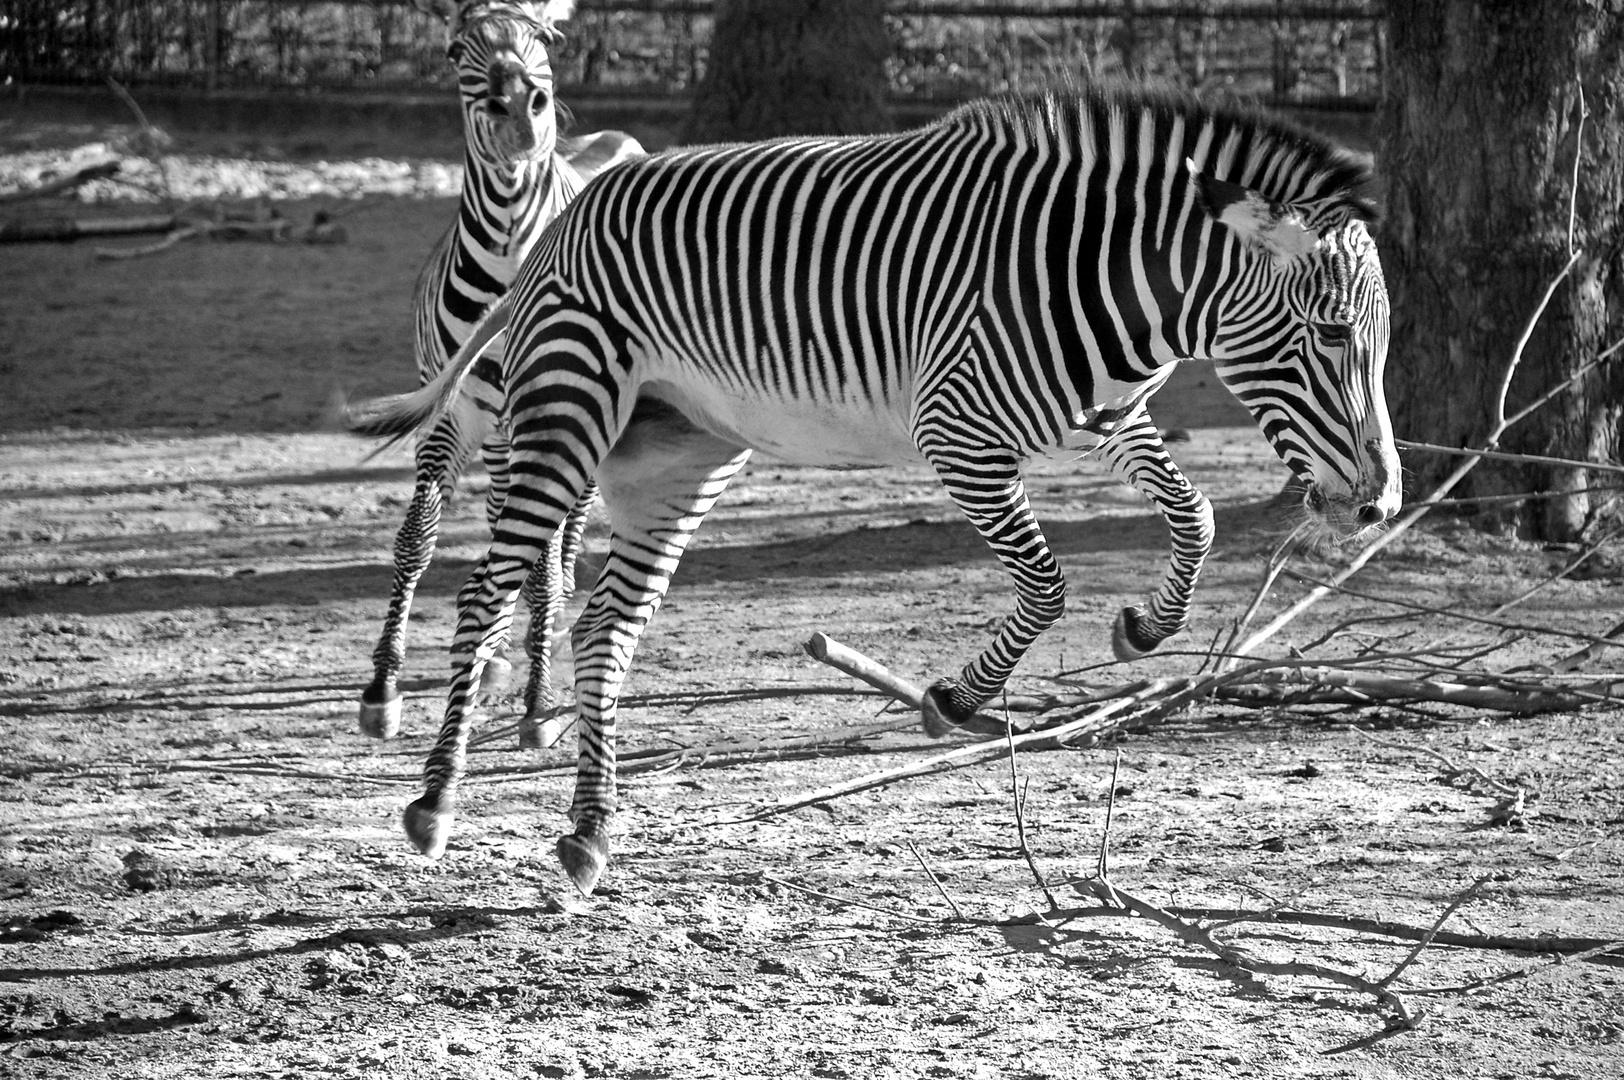 Zebra in Aktion